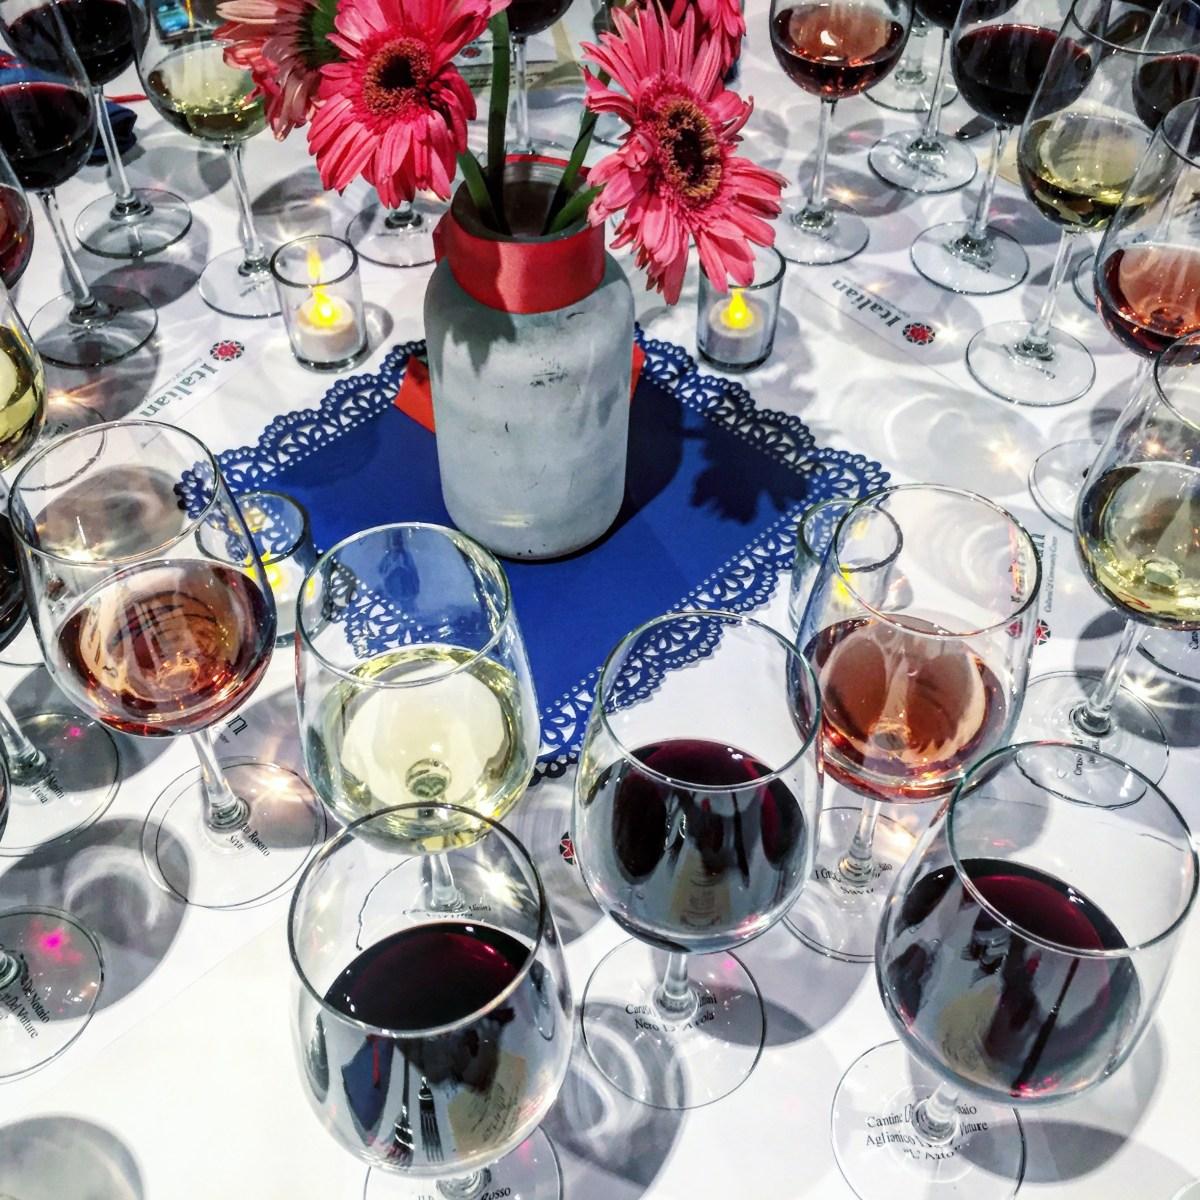 Italian Wine Tastings/Pairings at ICCC